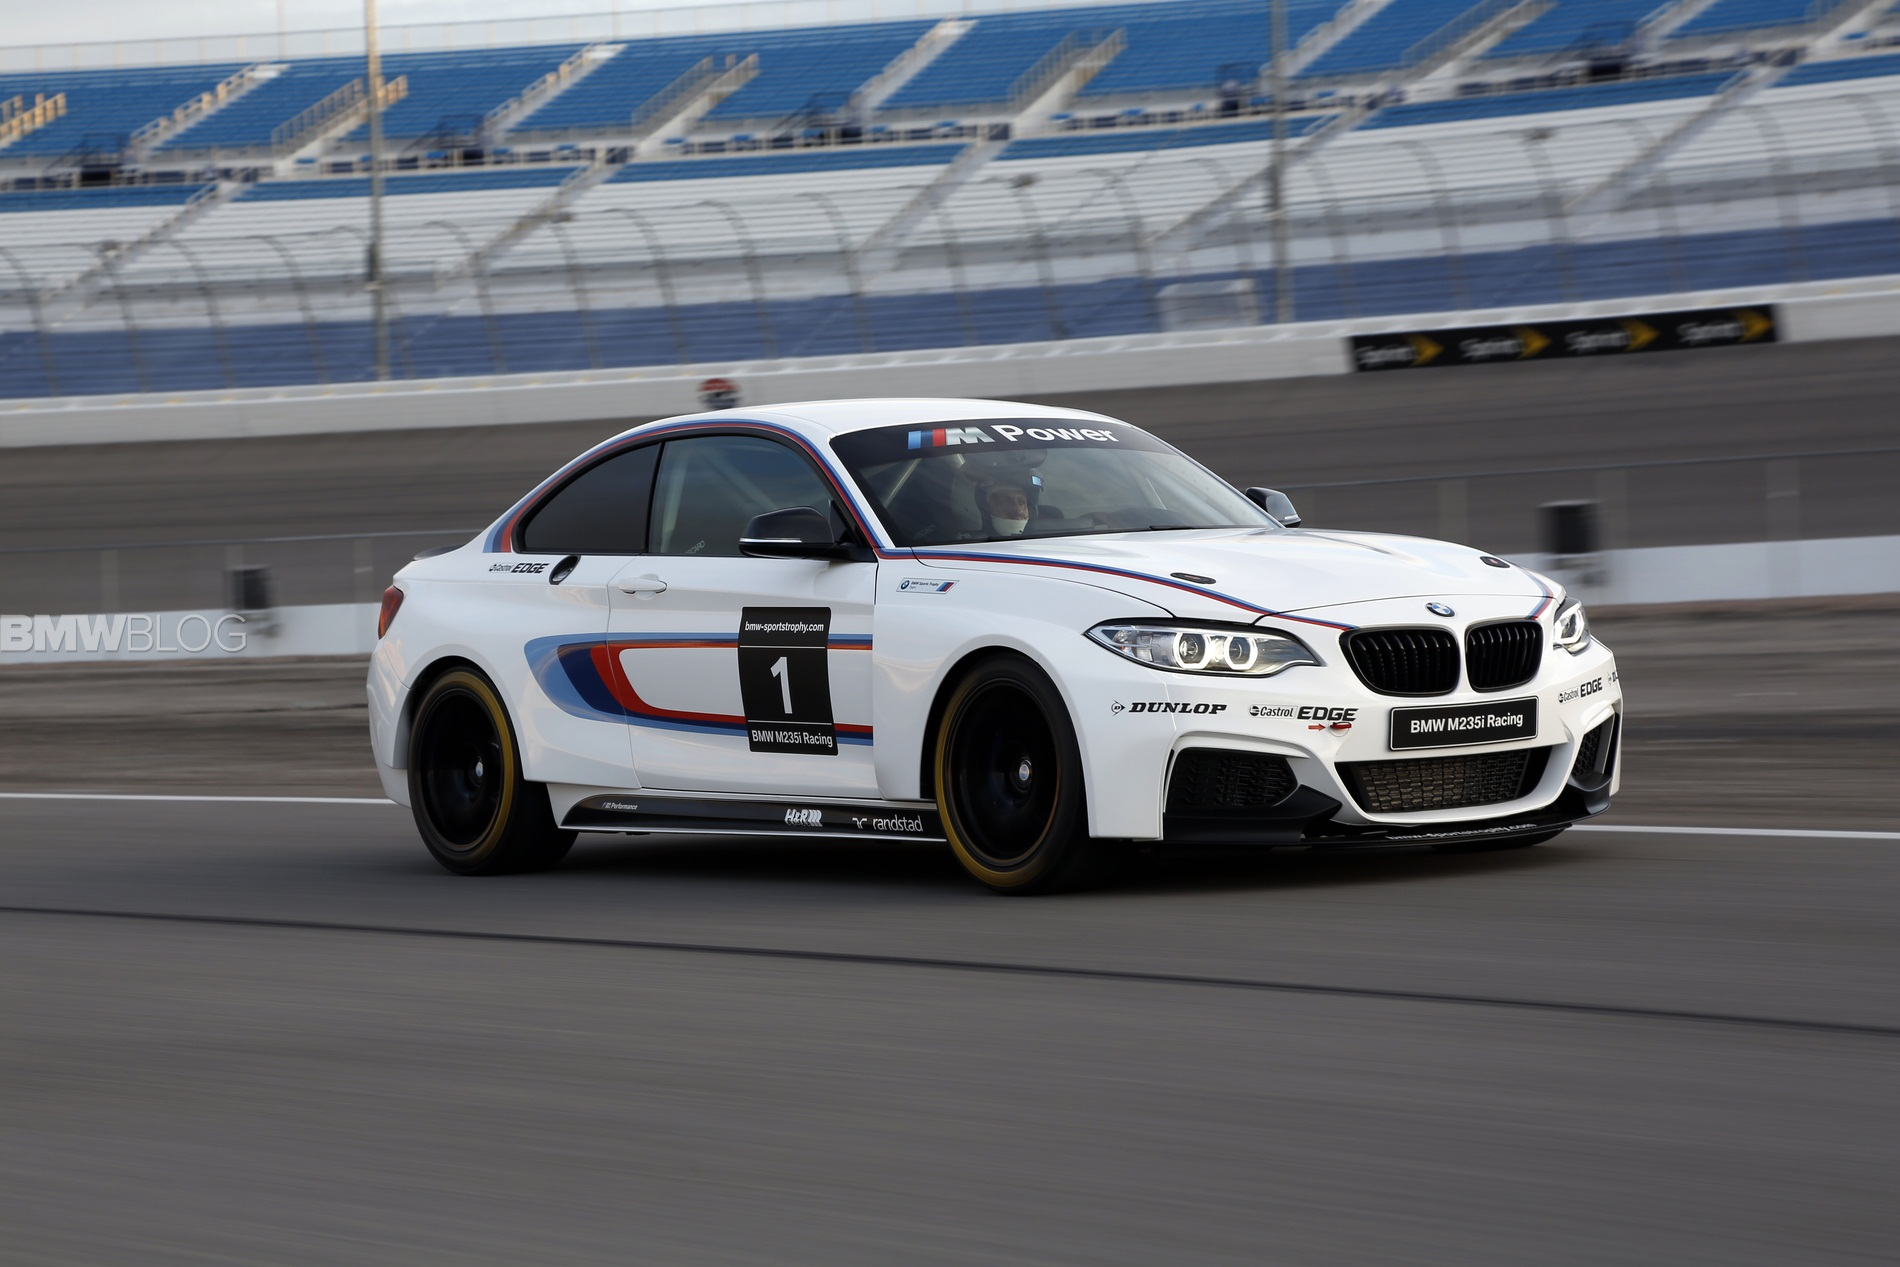 bmw m235i race car track 45